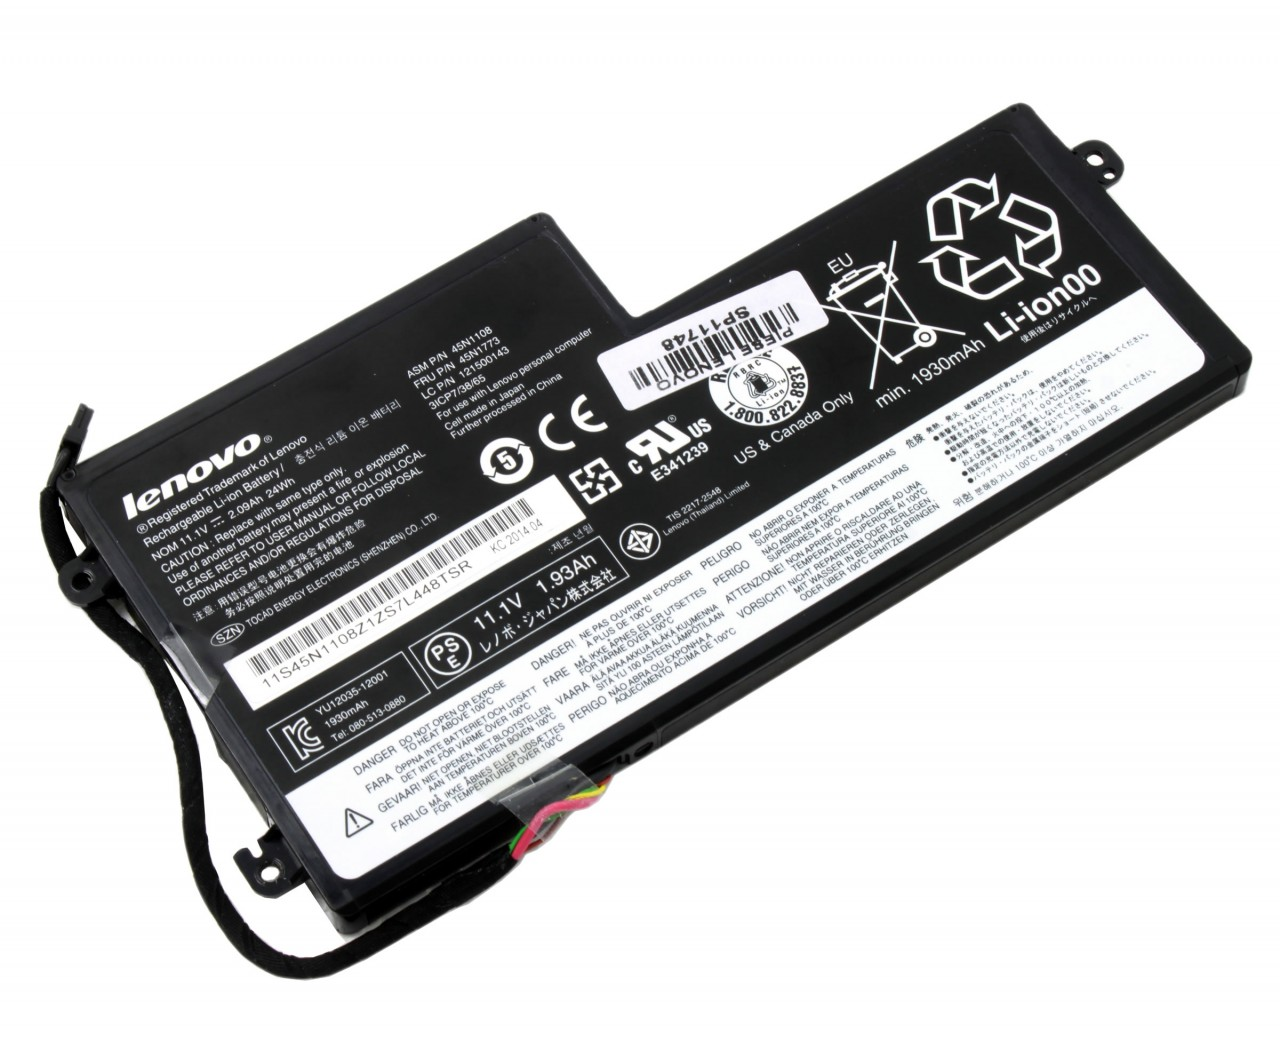 Baterie Lenovo ThinkPad T530 2394 Originala 24Wh imagine powerlaptop.ro 2021